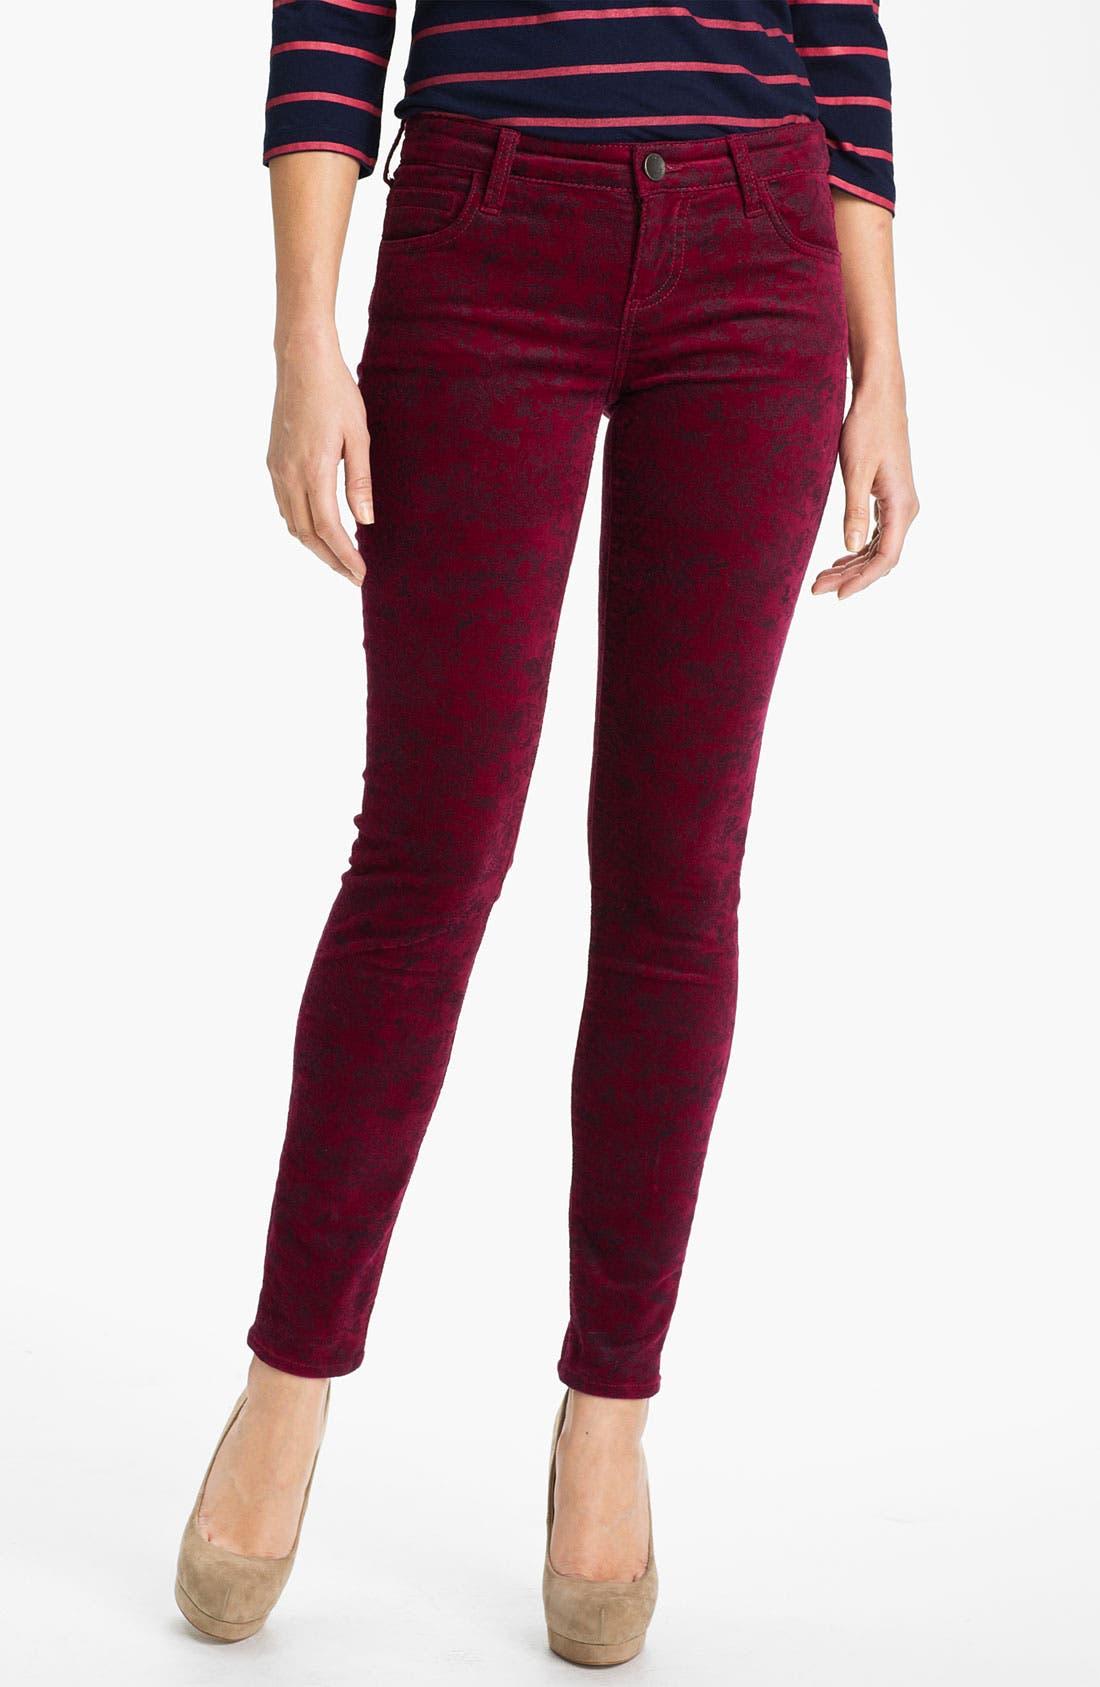 Main Image - KUT from the Kloth Velveteen Skinny Jeans